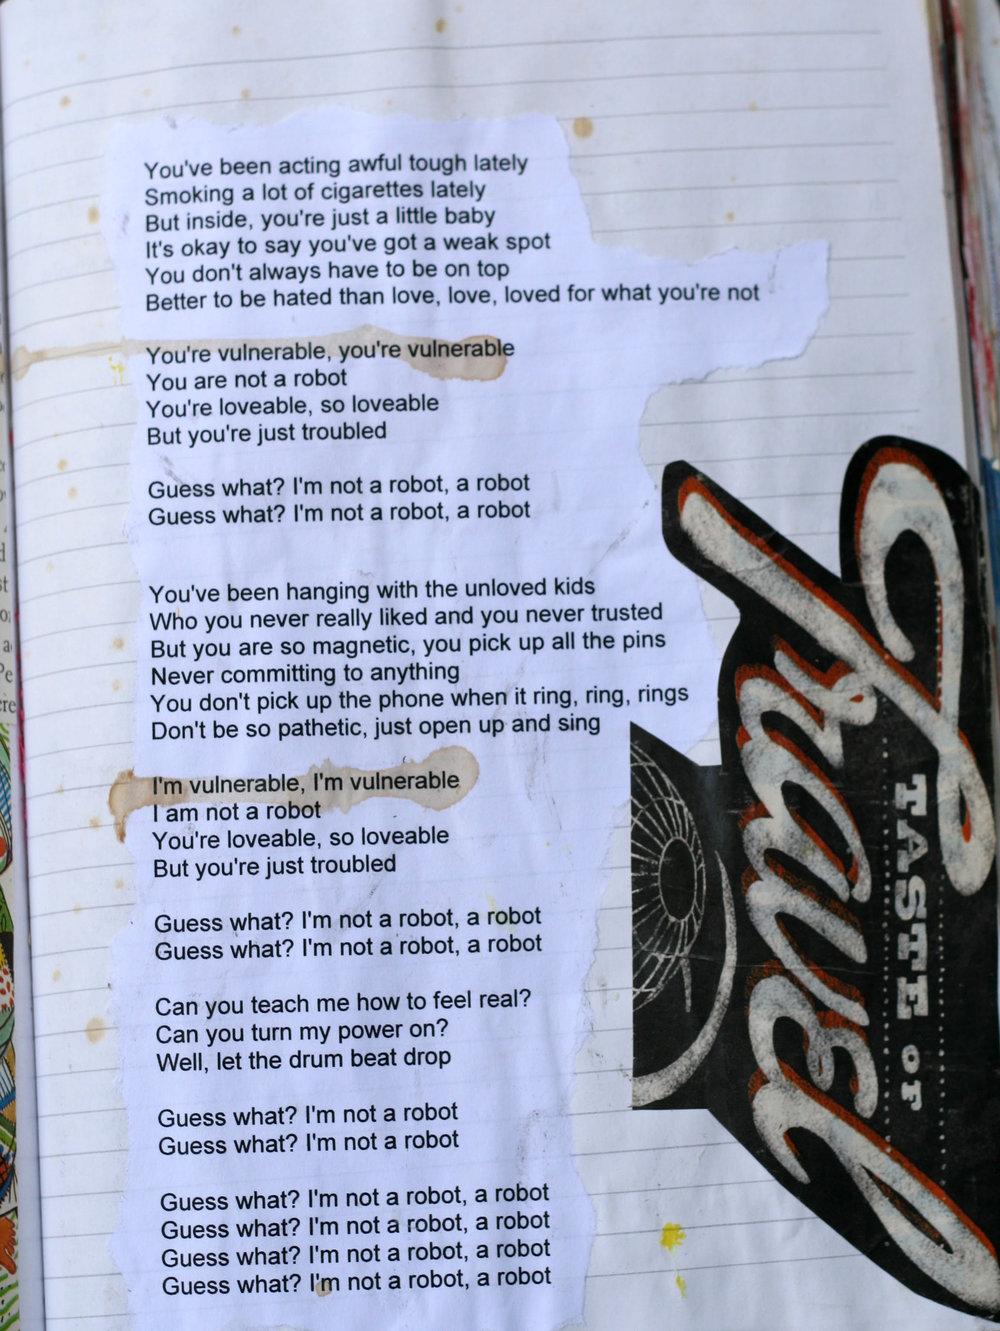 I'm Not A Robot song lyrics by Marina and the Diamons